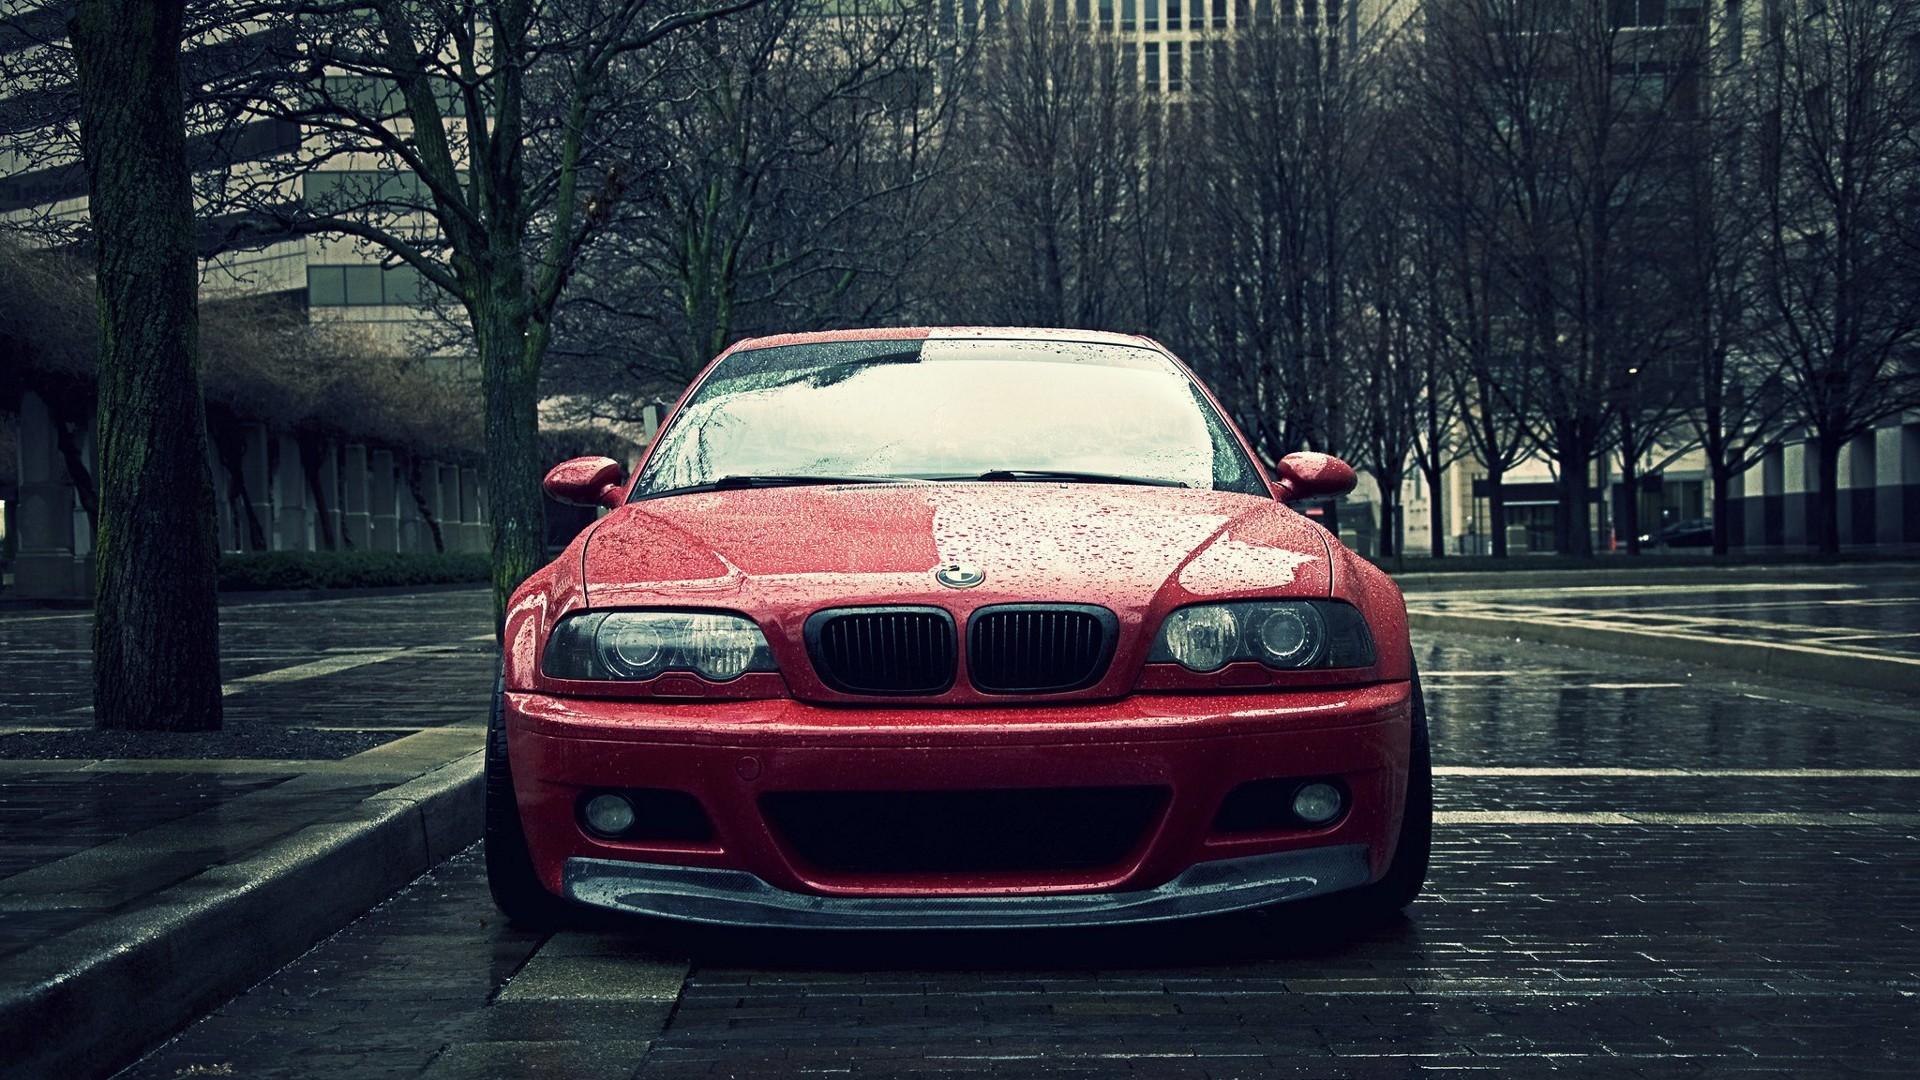 General 1920x1080 car BMW rain city red cars vehicle BMW 3 Series BMW E46 frontal view BMW M3